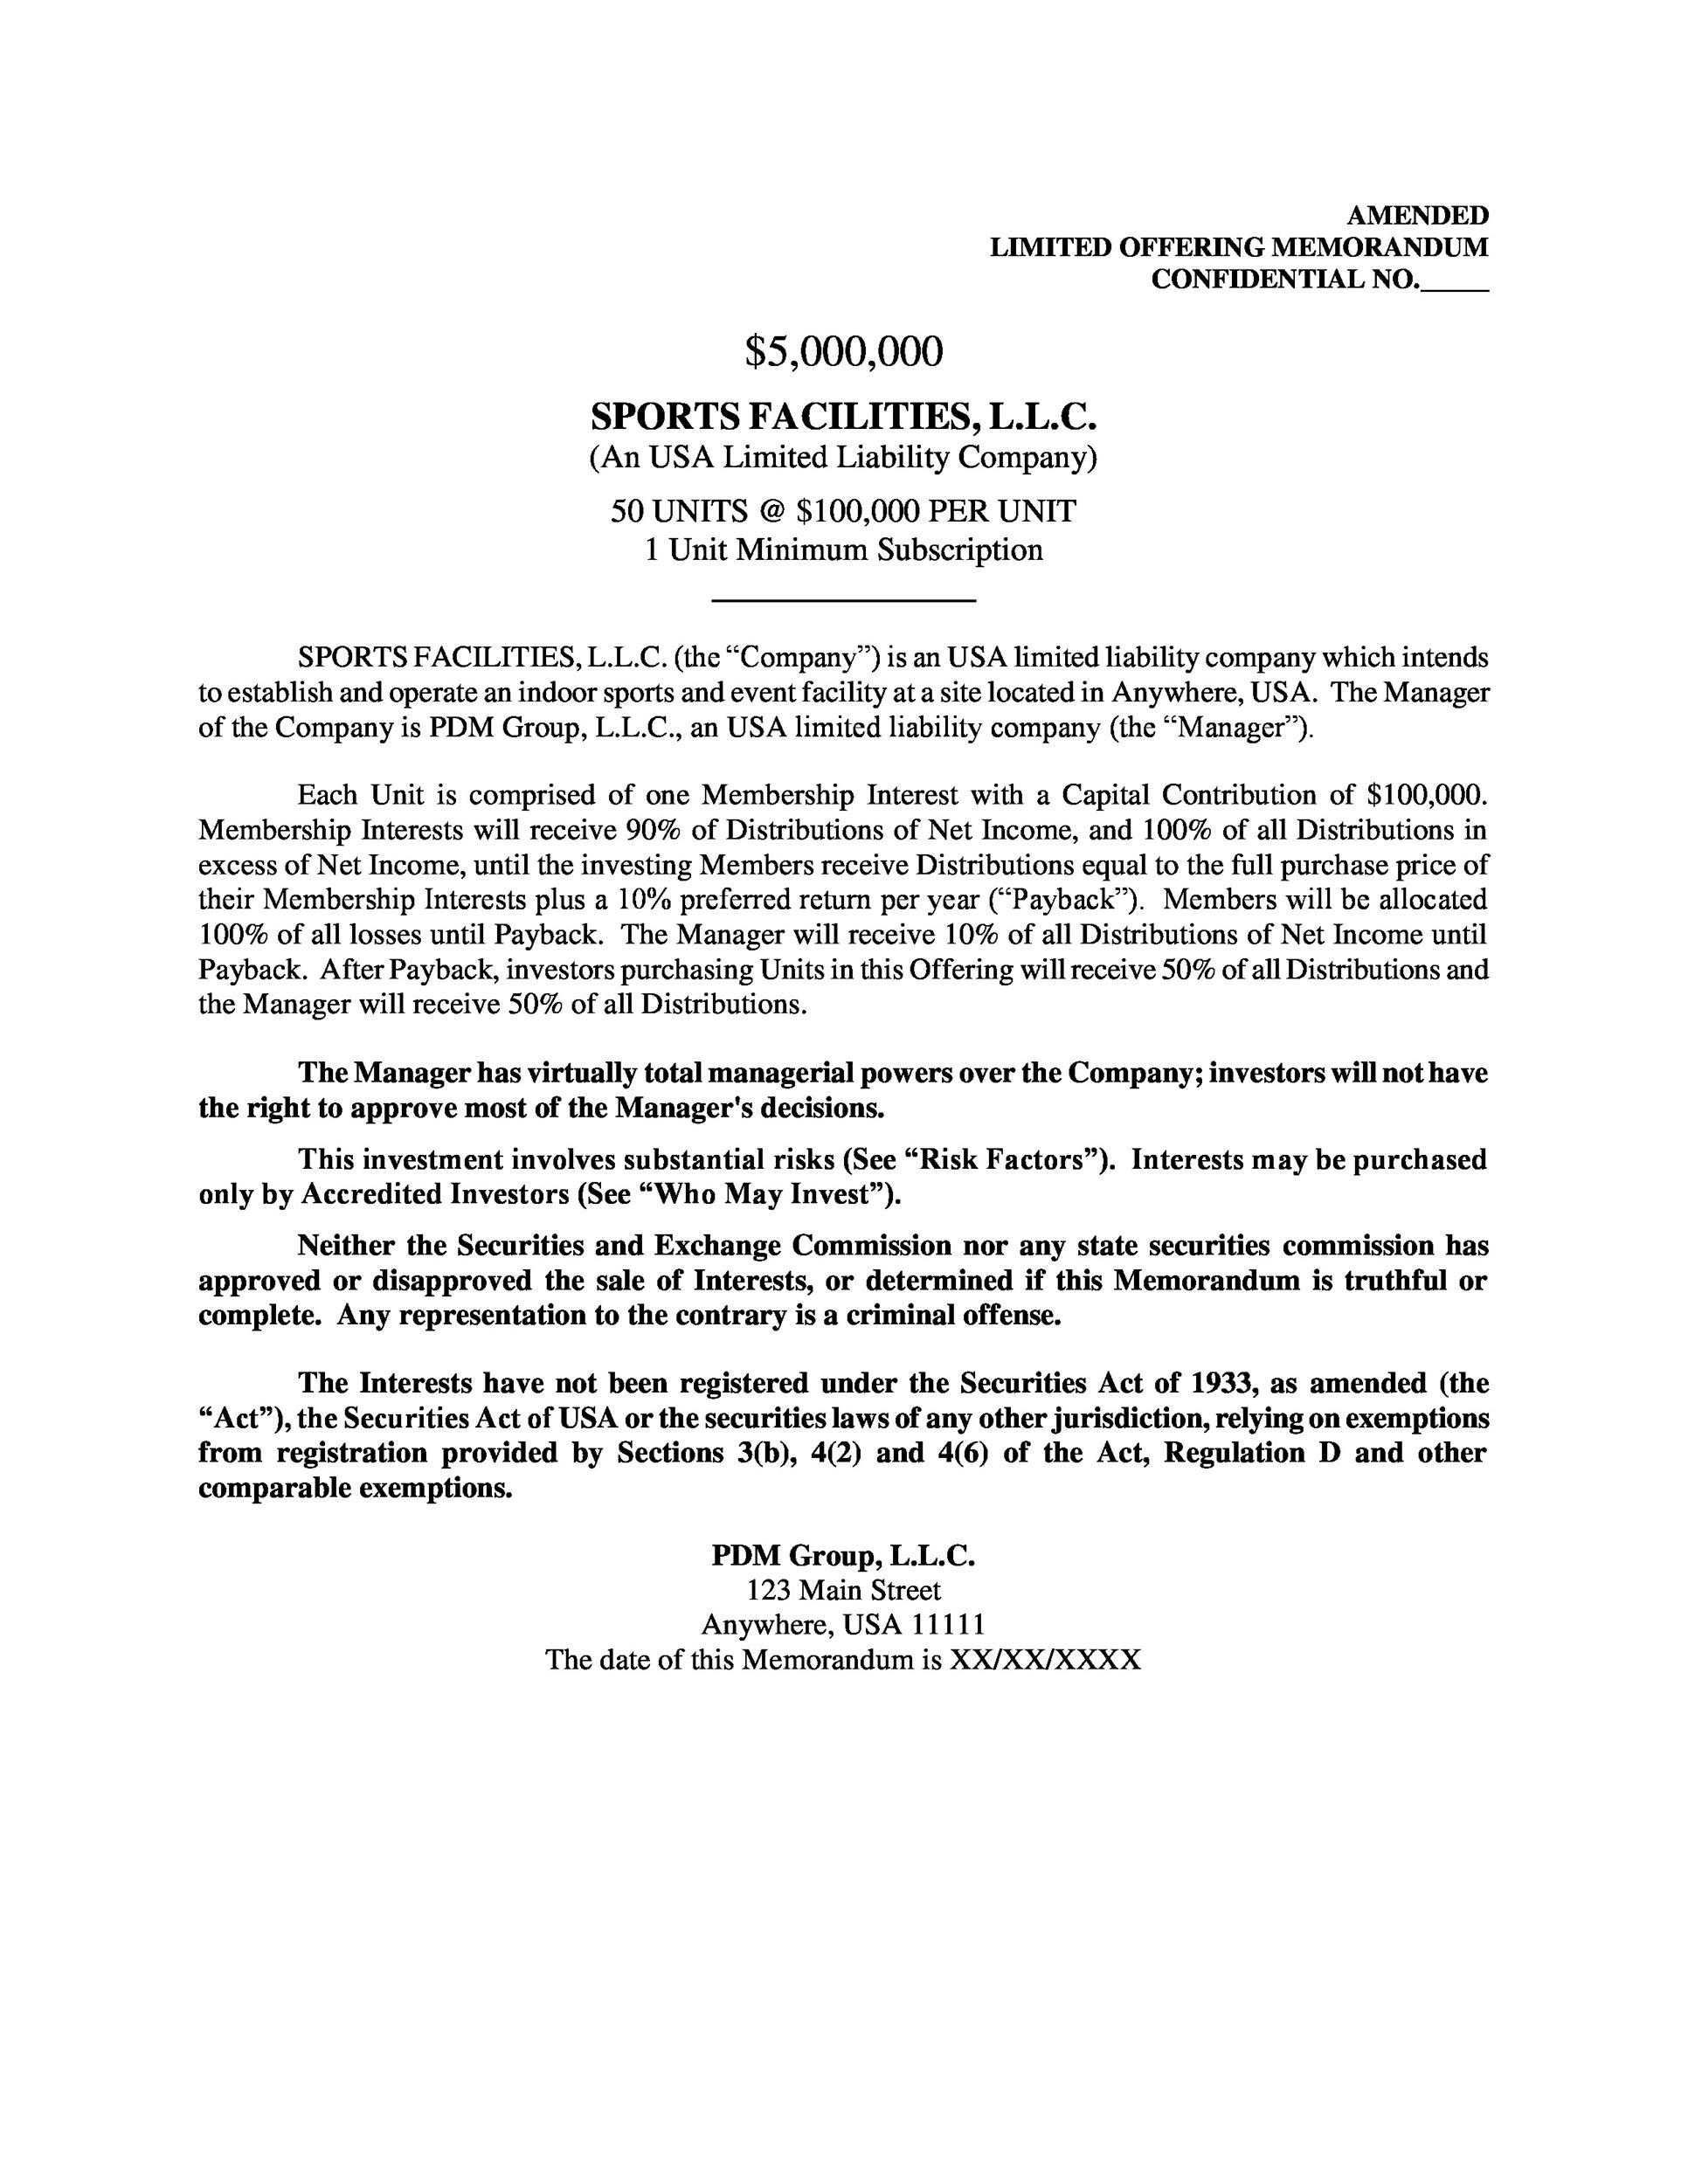 Free private placement memorandum template 16